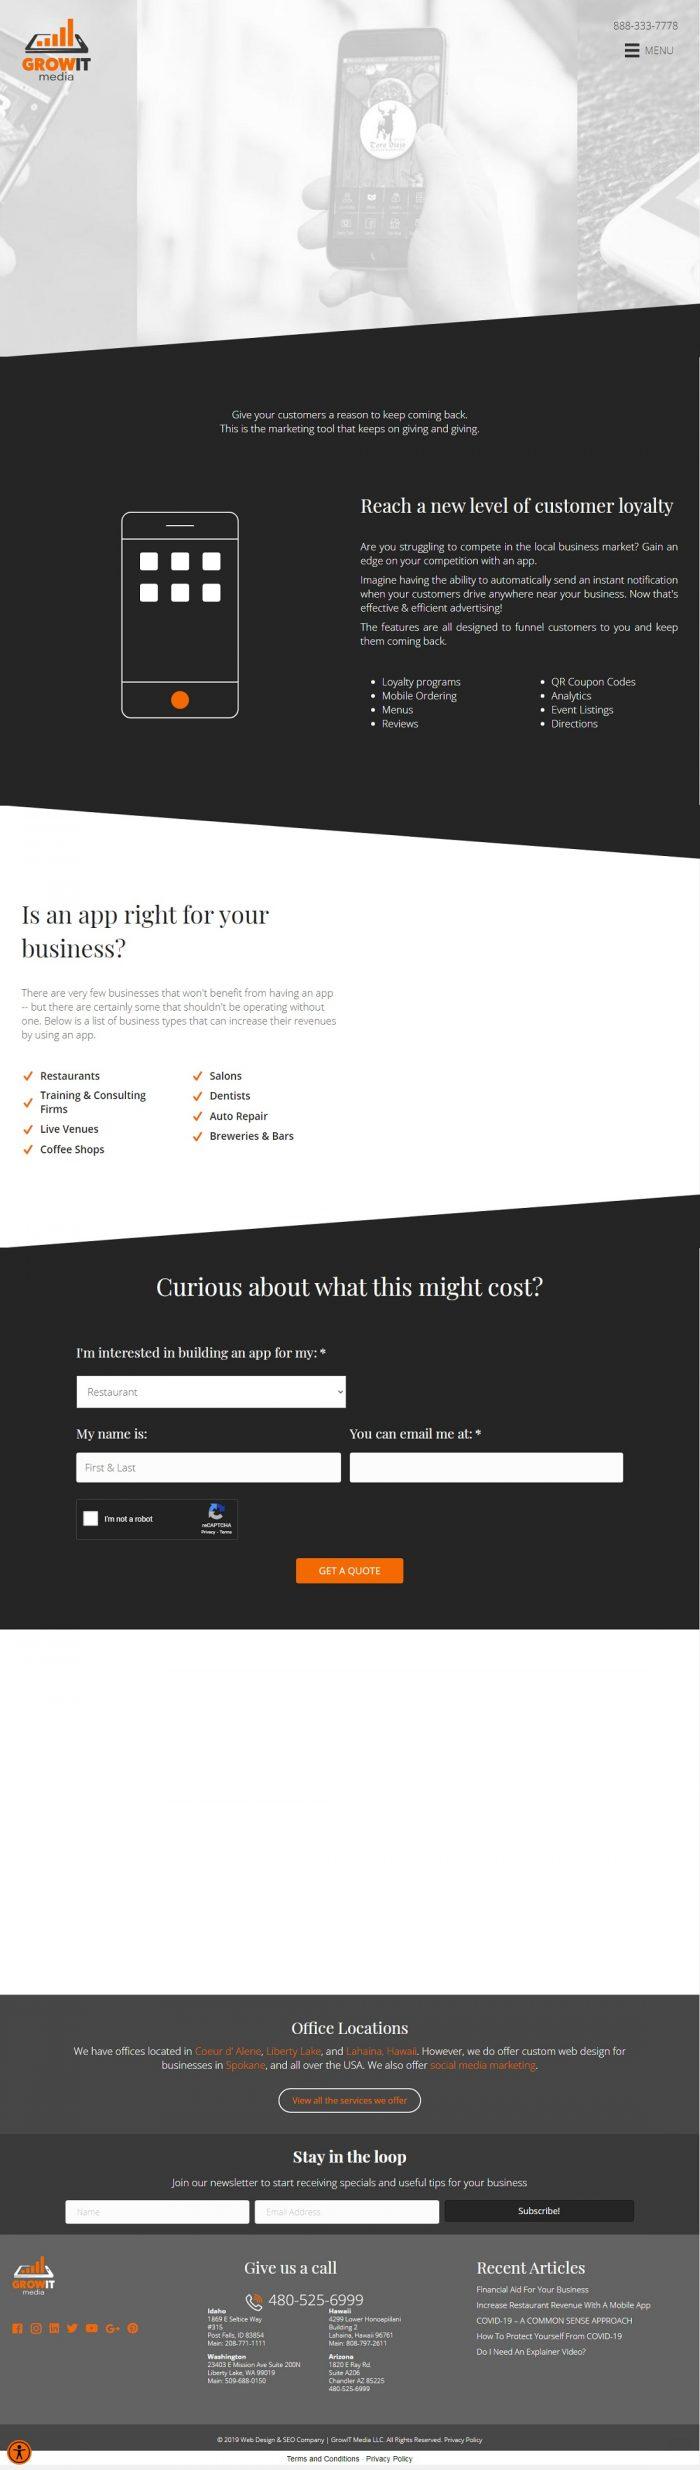 Mobile app development arizona